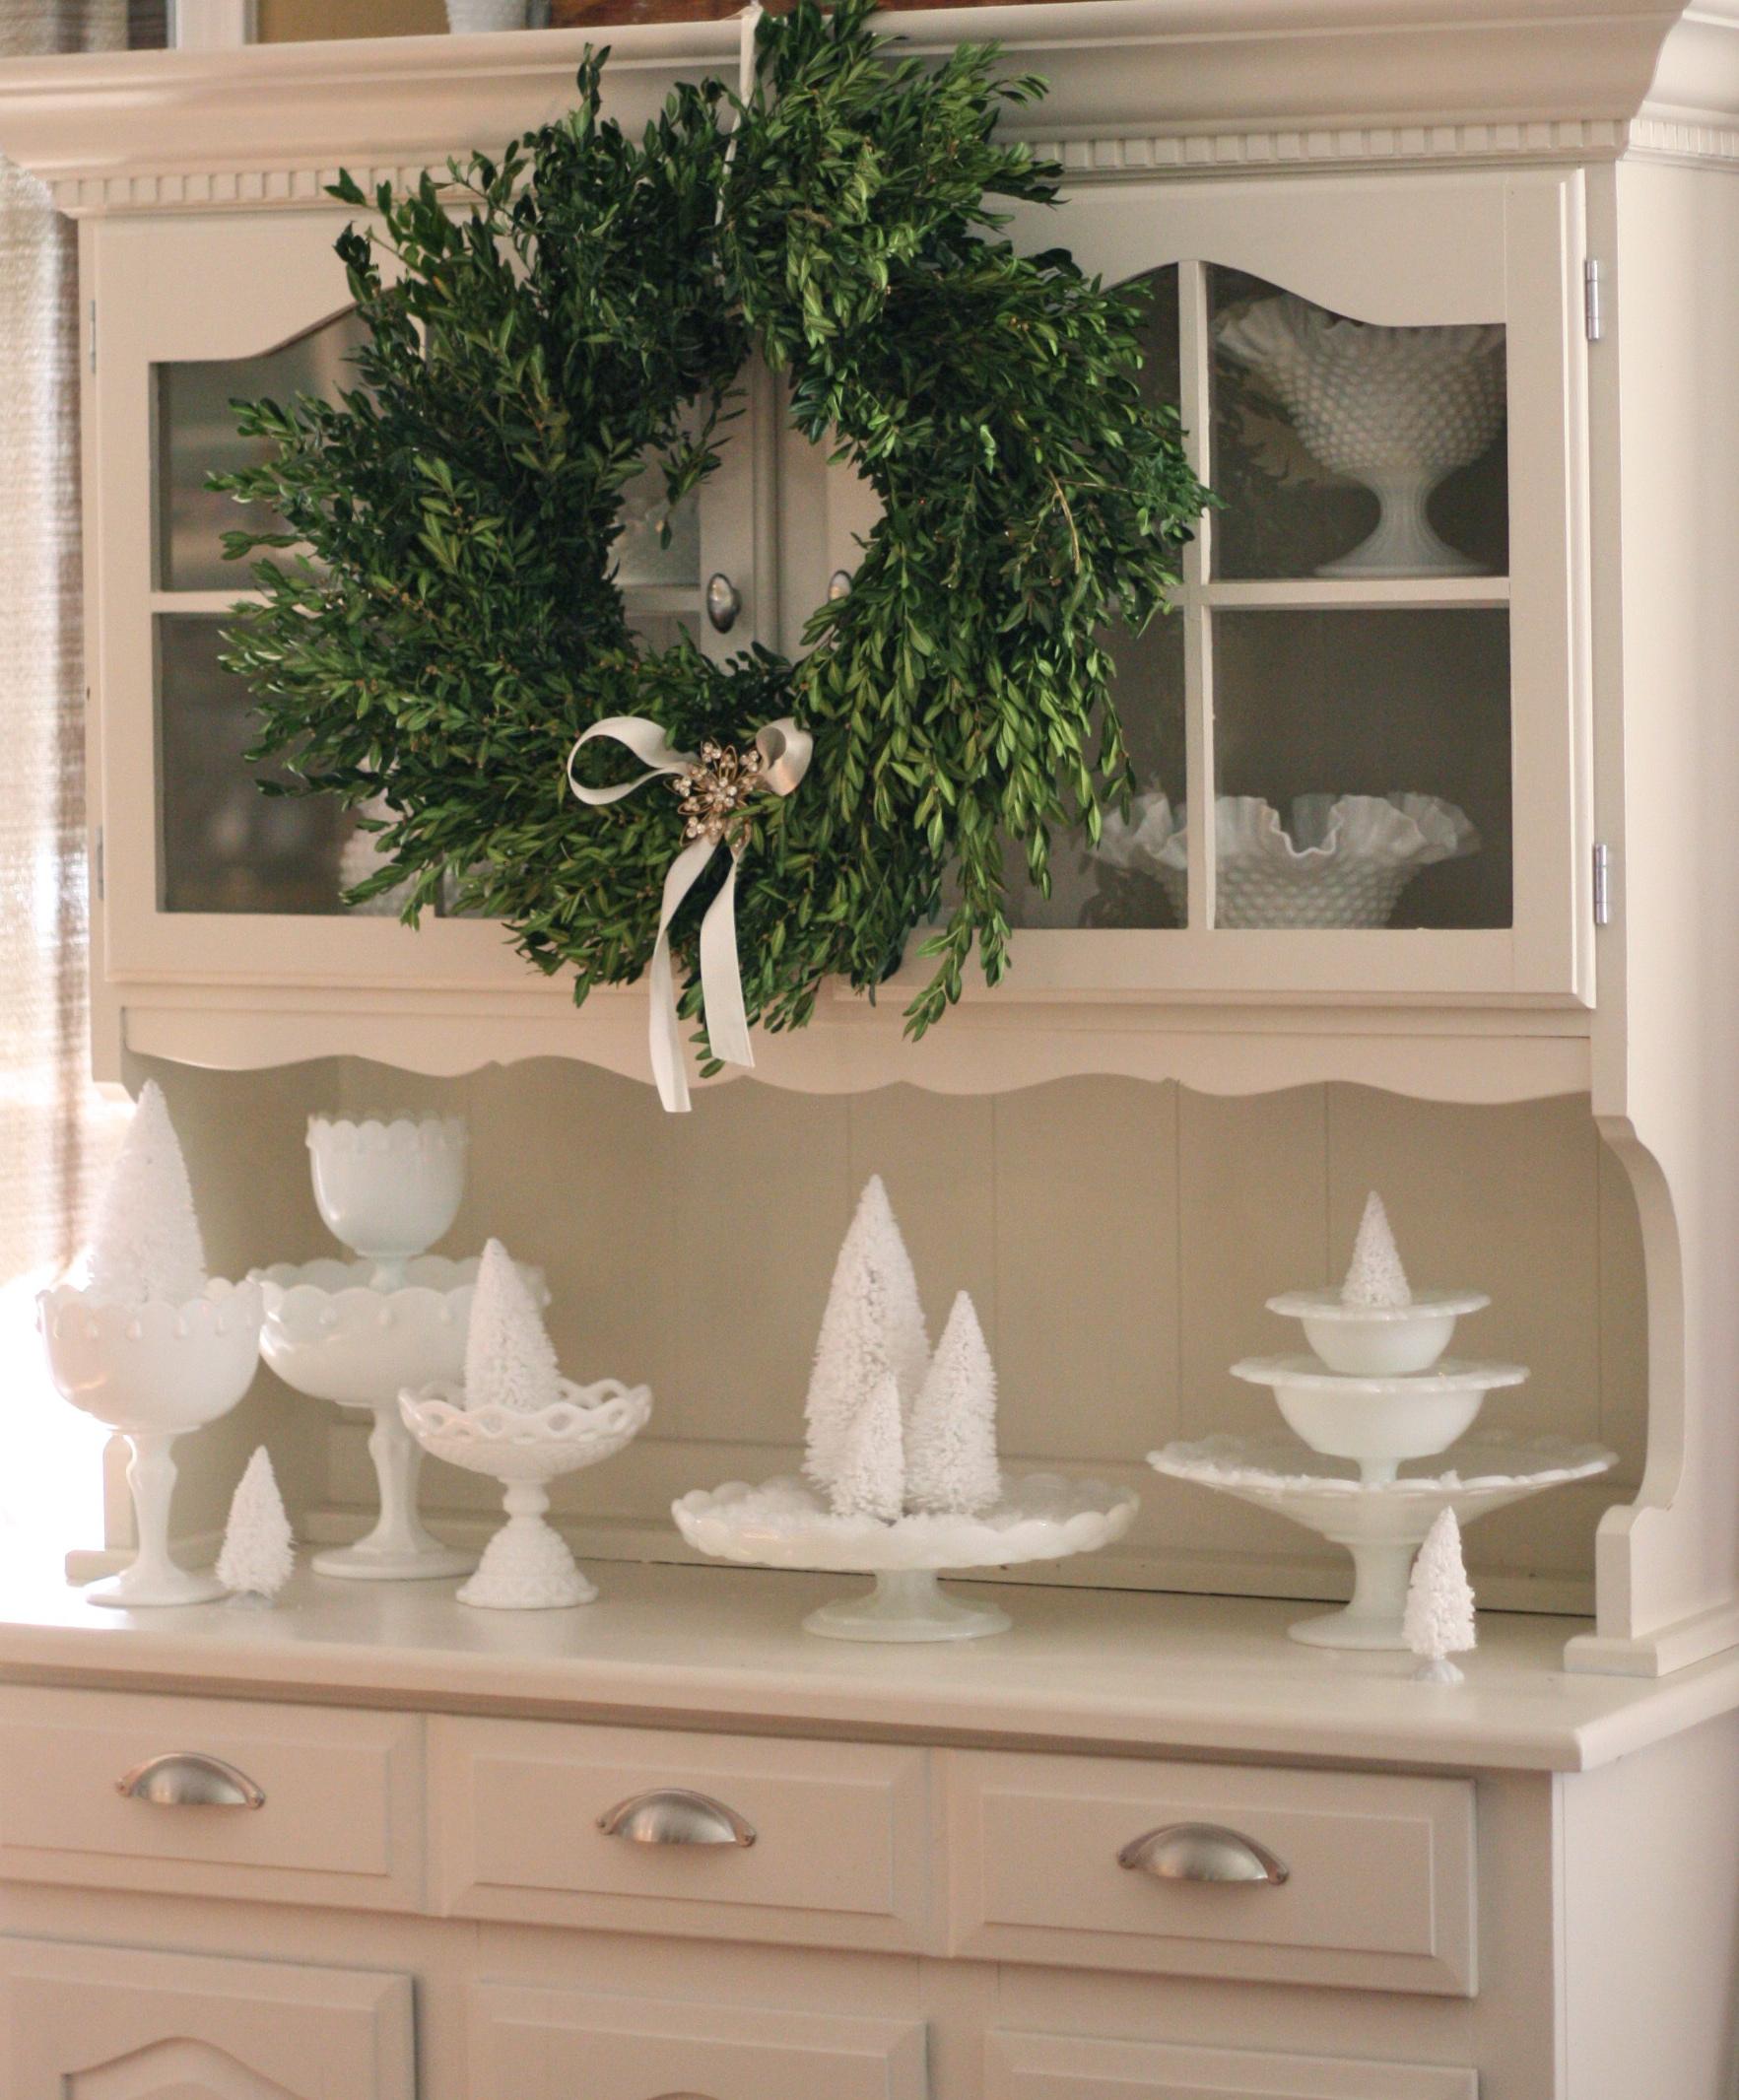 Pinterest Home Decor 2014: Eve, My Goodwill Hutch